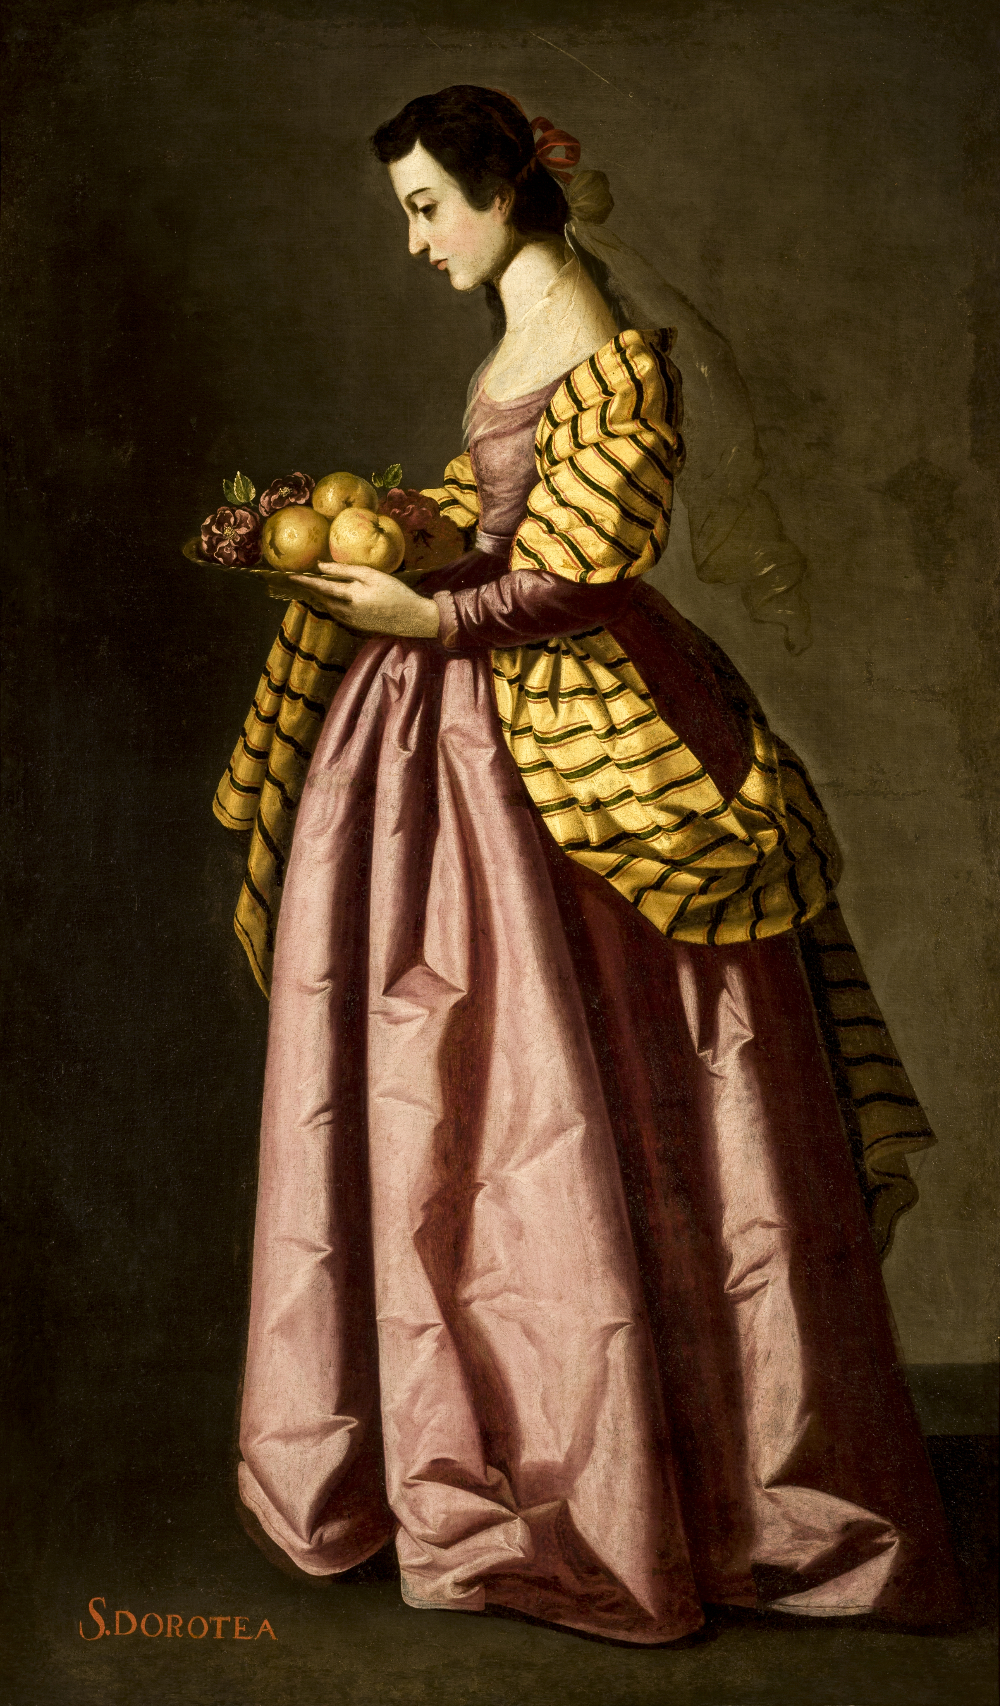 Francisco de Zurbarán (1598-1664): Den hellige Dorothea